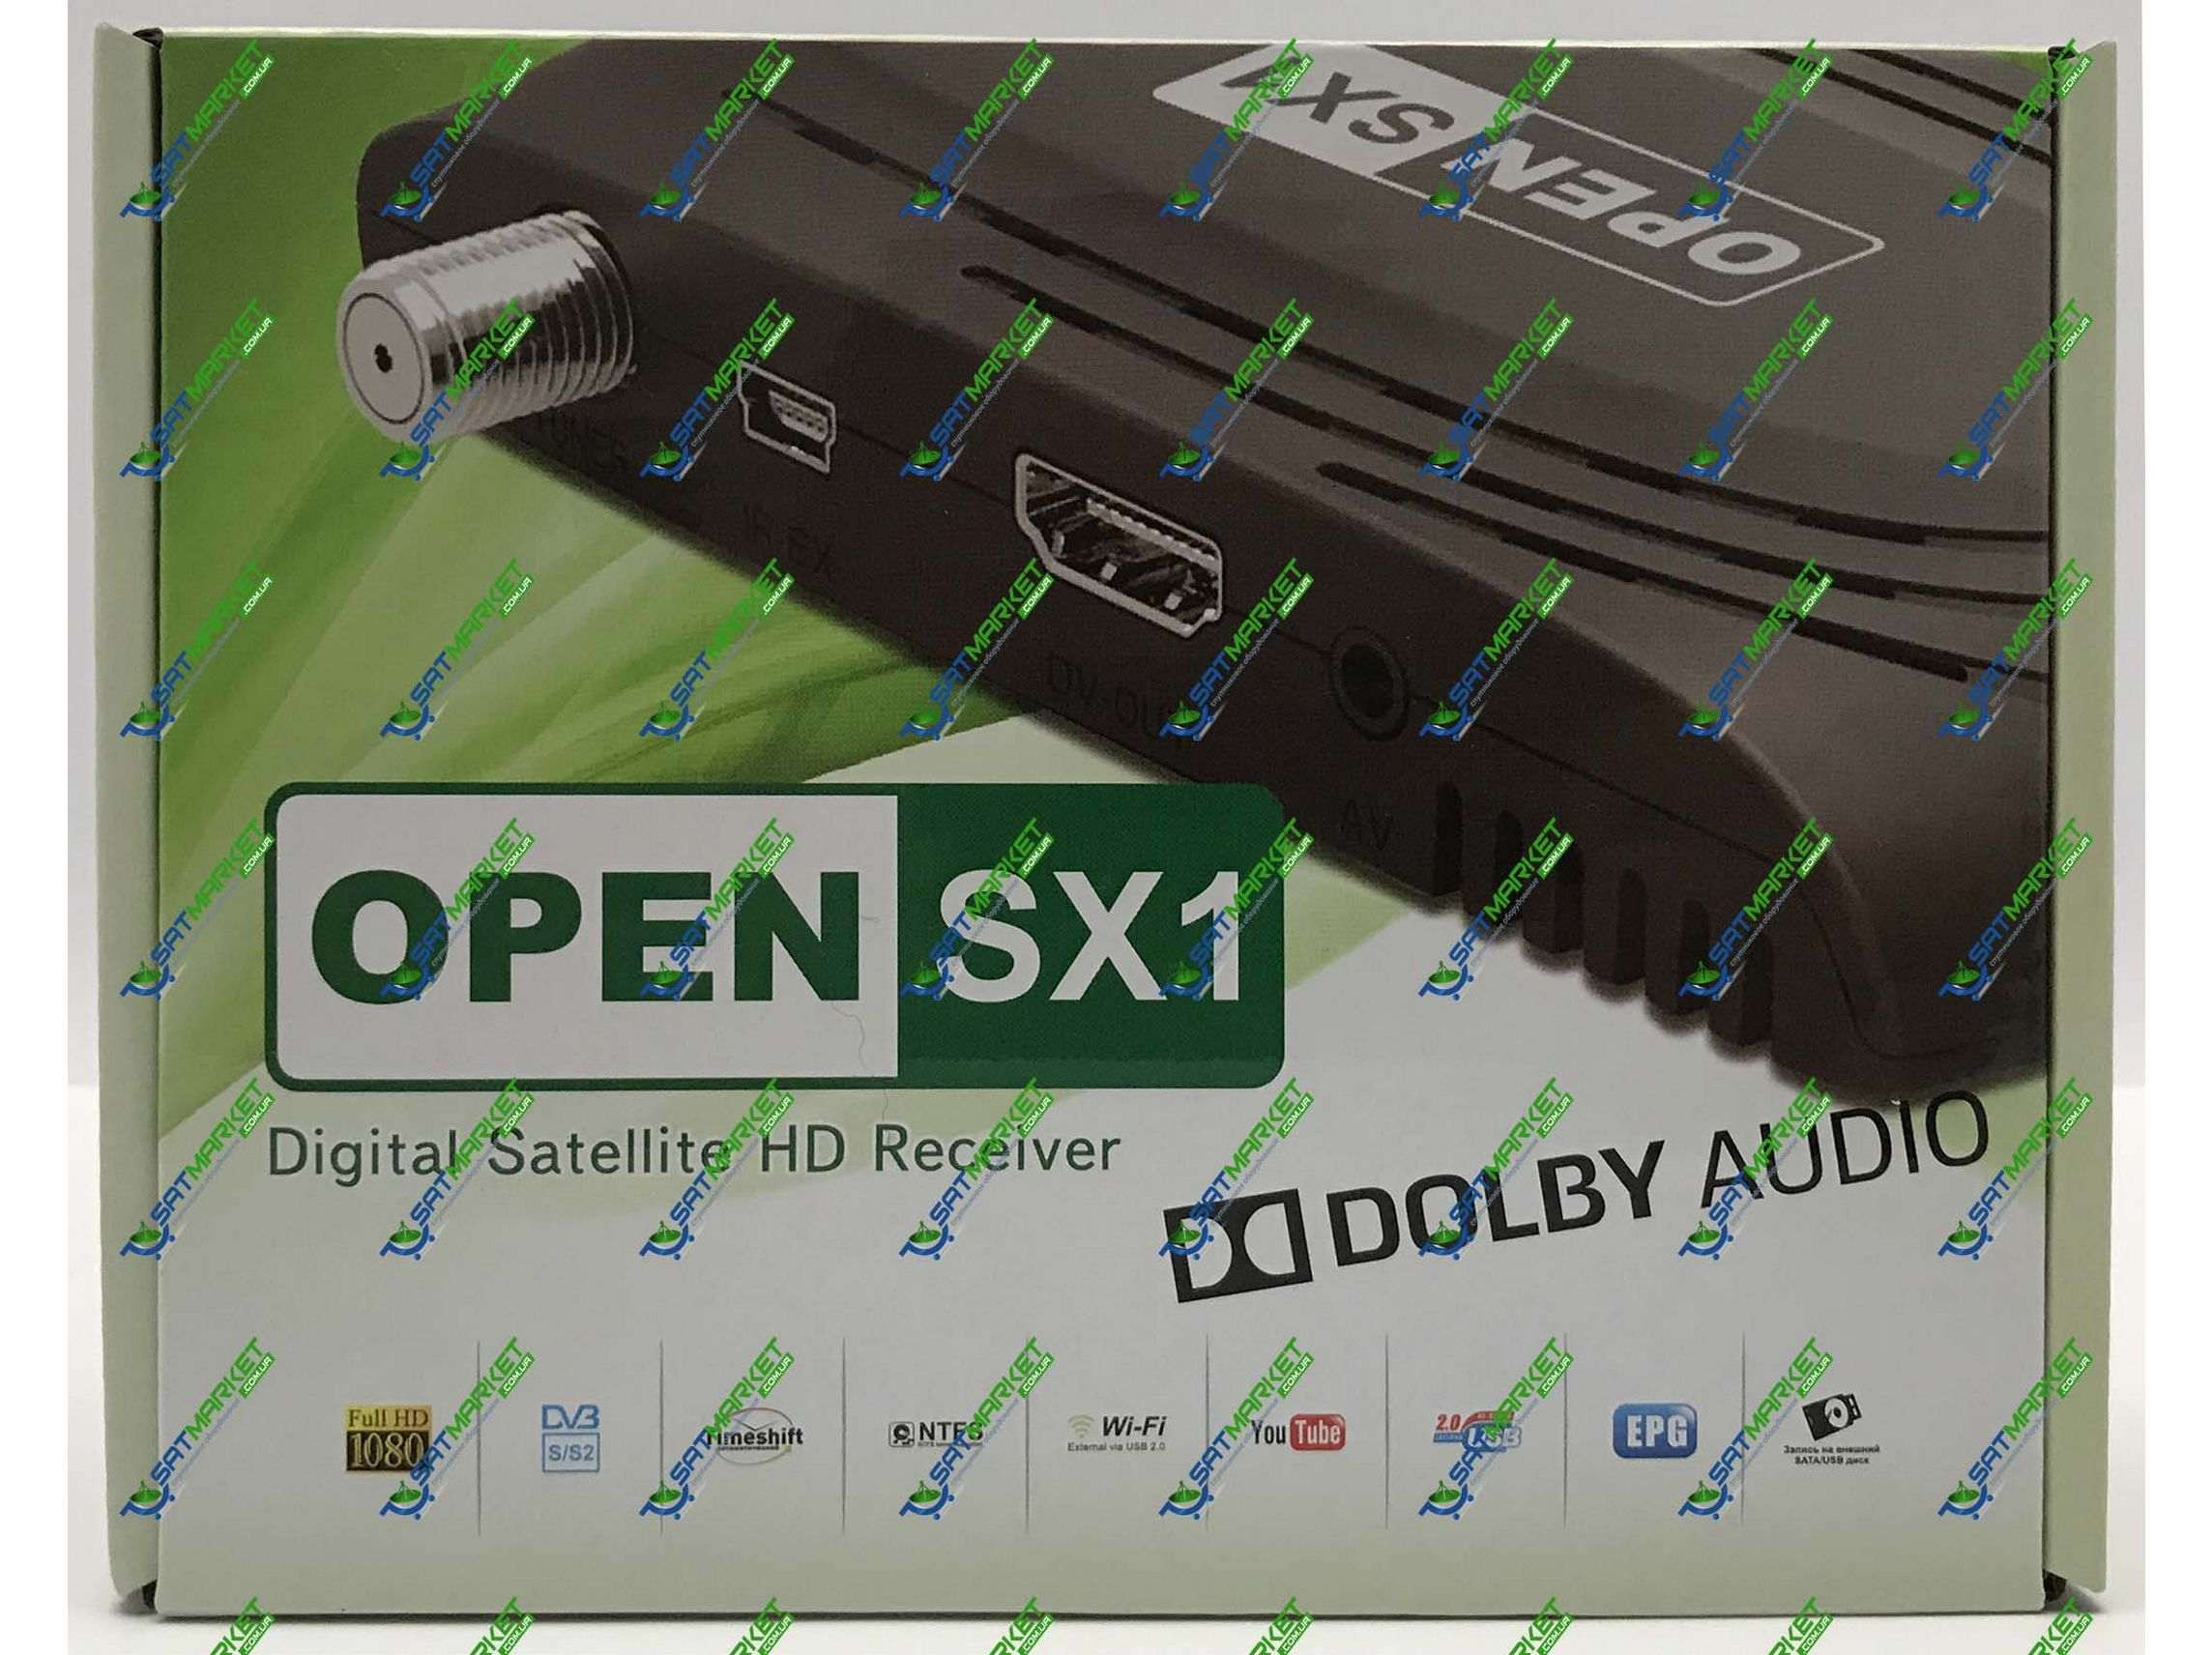 Купить Openbox SX1 HD DOLBY AUDIO  Цена на Openbox SX1 HD